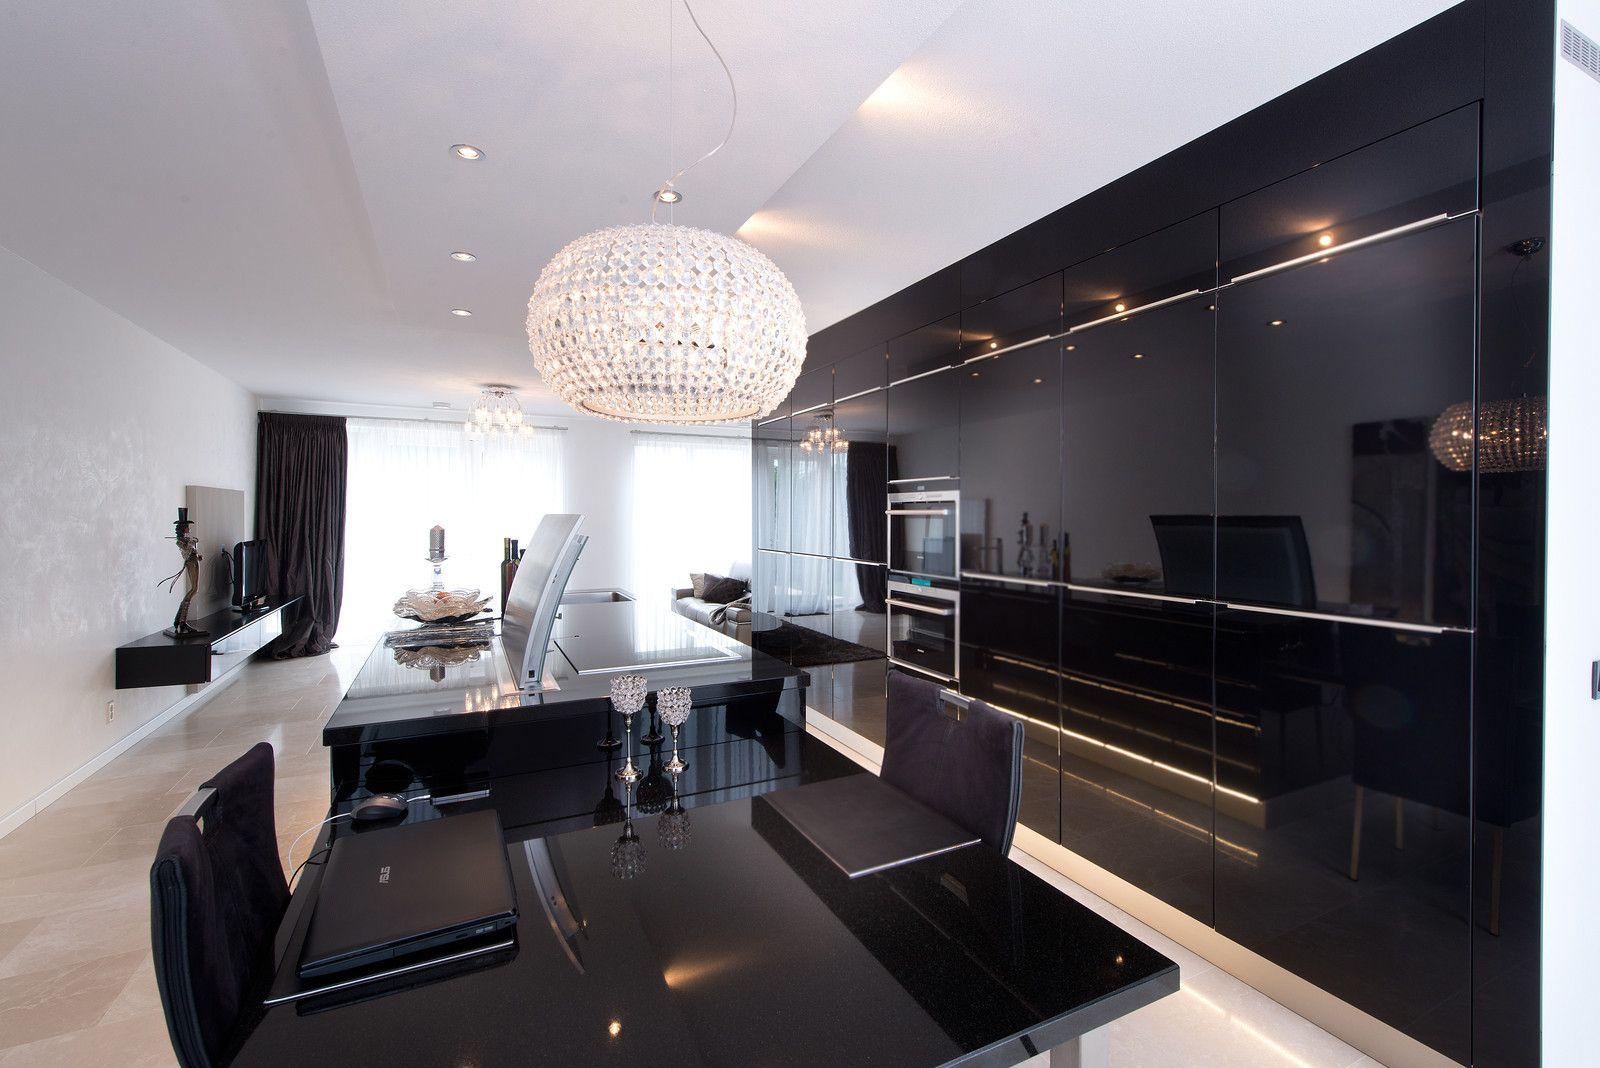 Strakke Zwarte Keuken : Tieleman keuken model next125 hoogglans zwart gelakt kopen